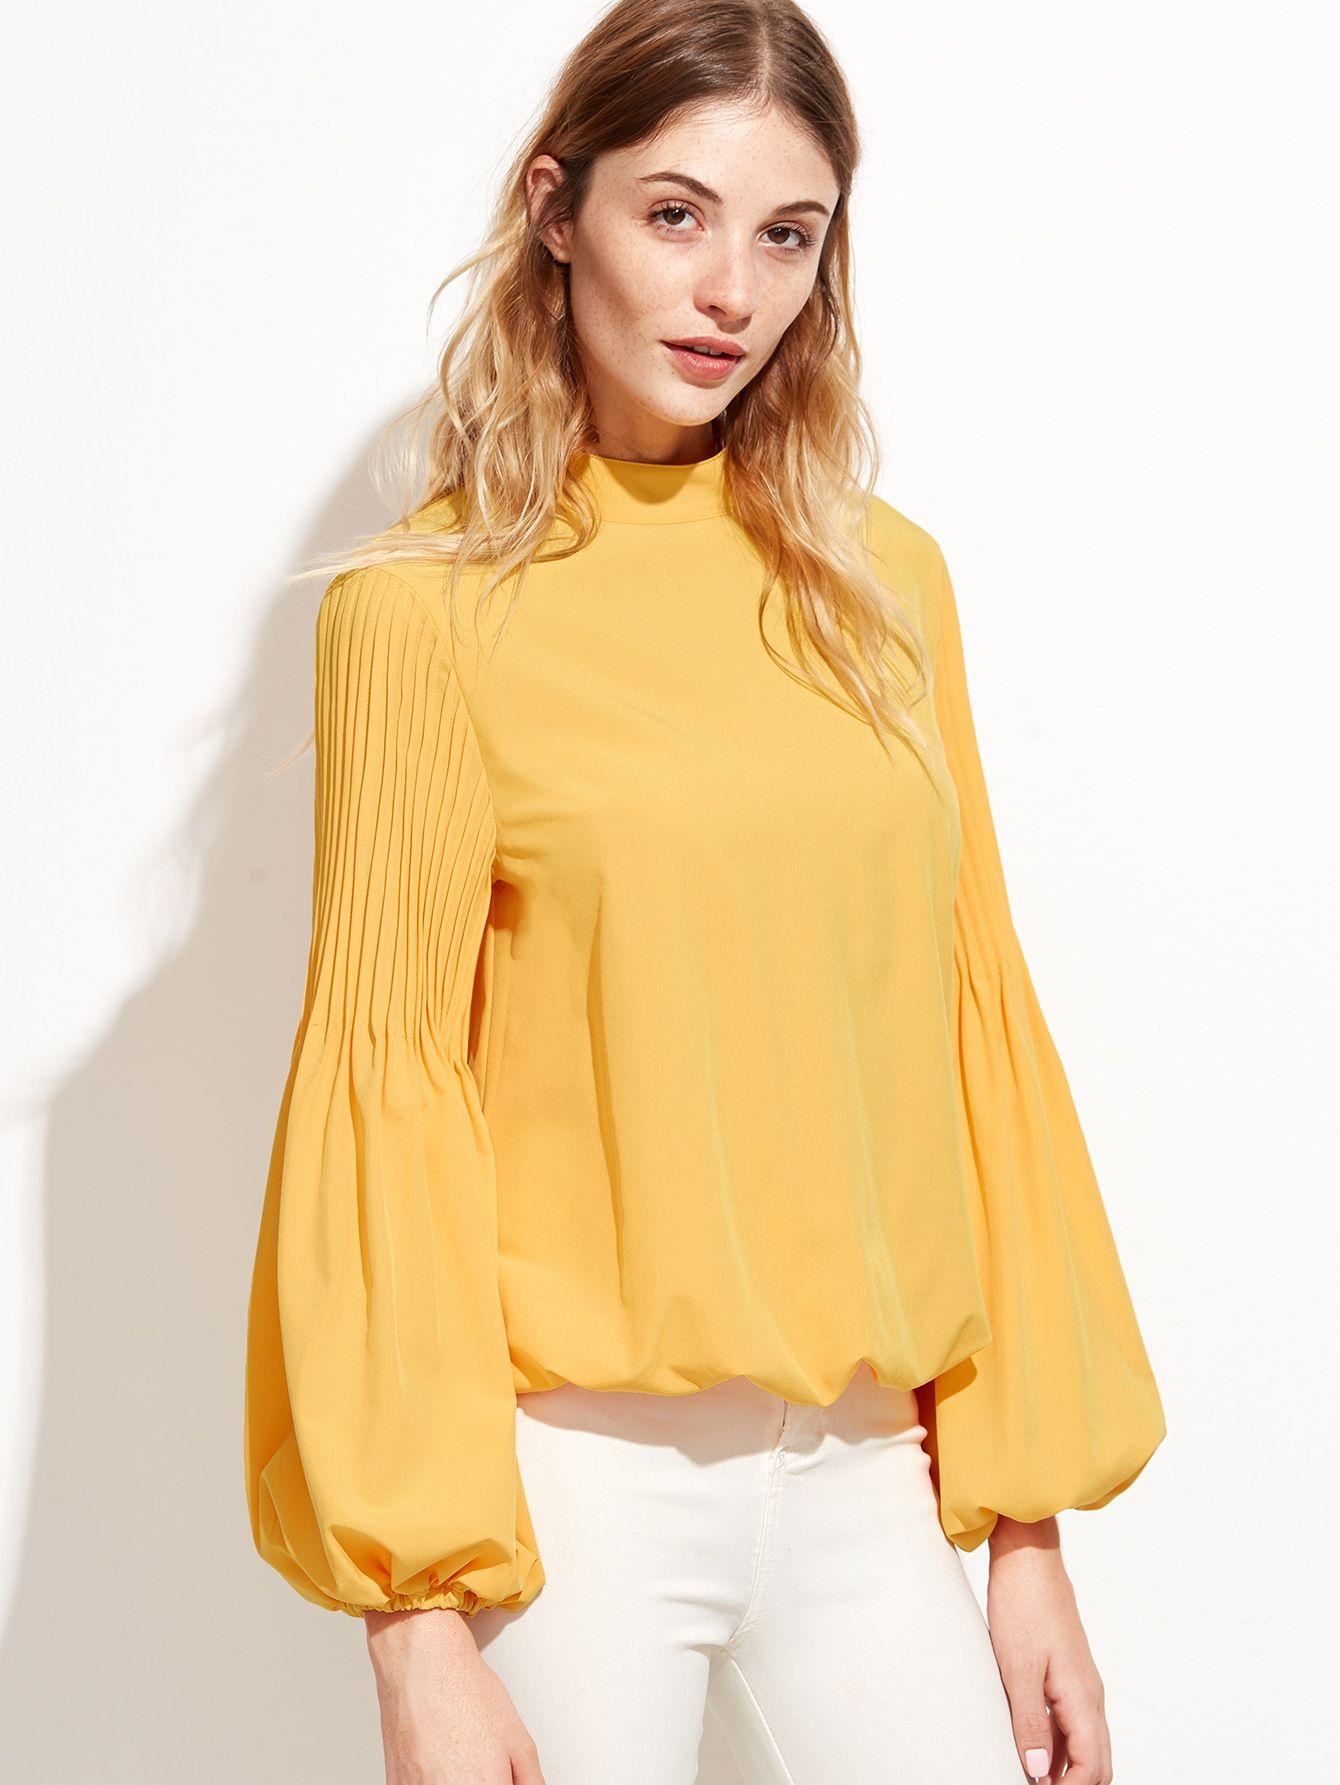 823b0d679559f  AdoreWe  SheIn Blouses - SheIn Yellow Keyhole Mock Neck Pleated Lantern  Sleeve Blouse - AdoreWe.com